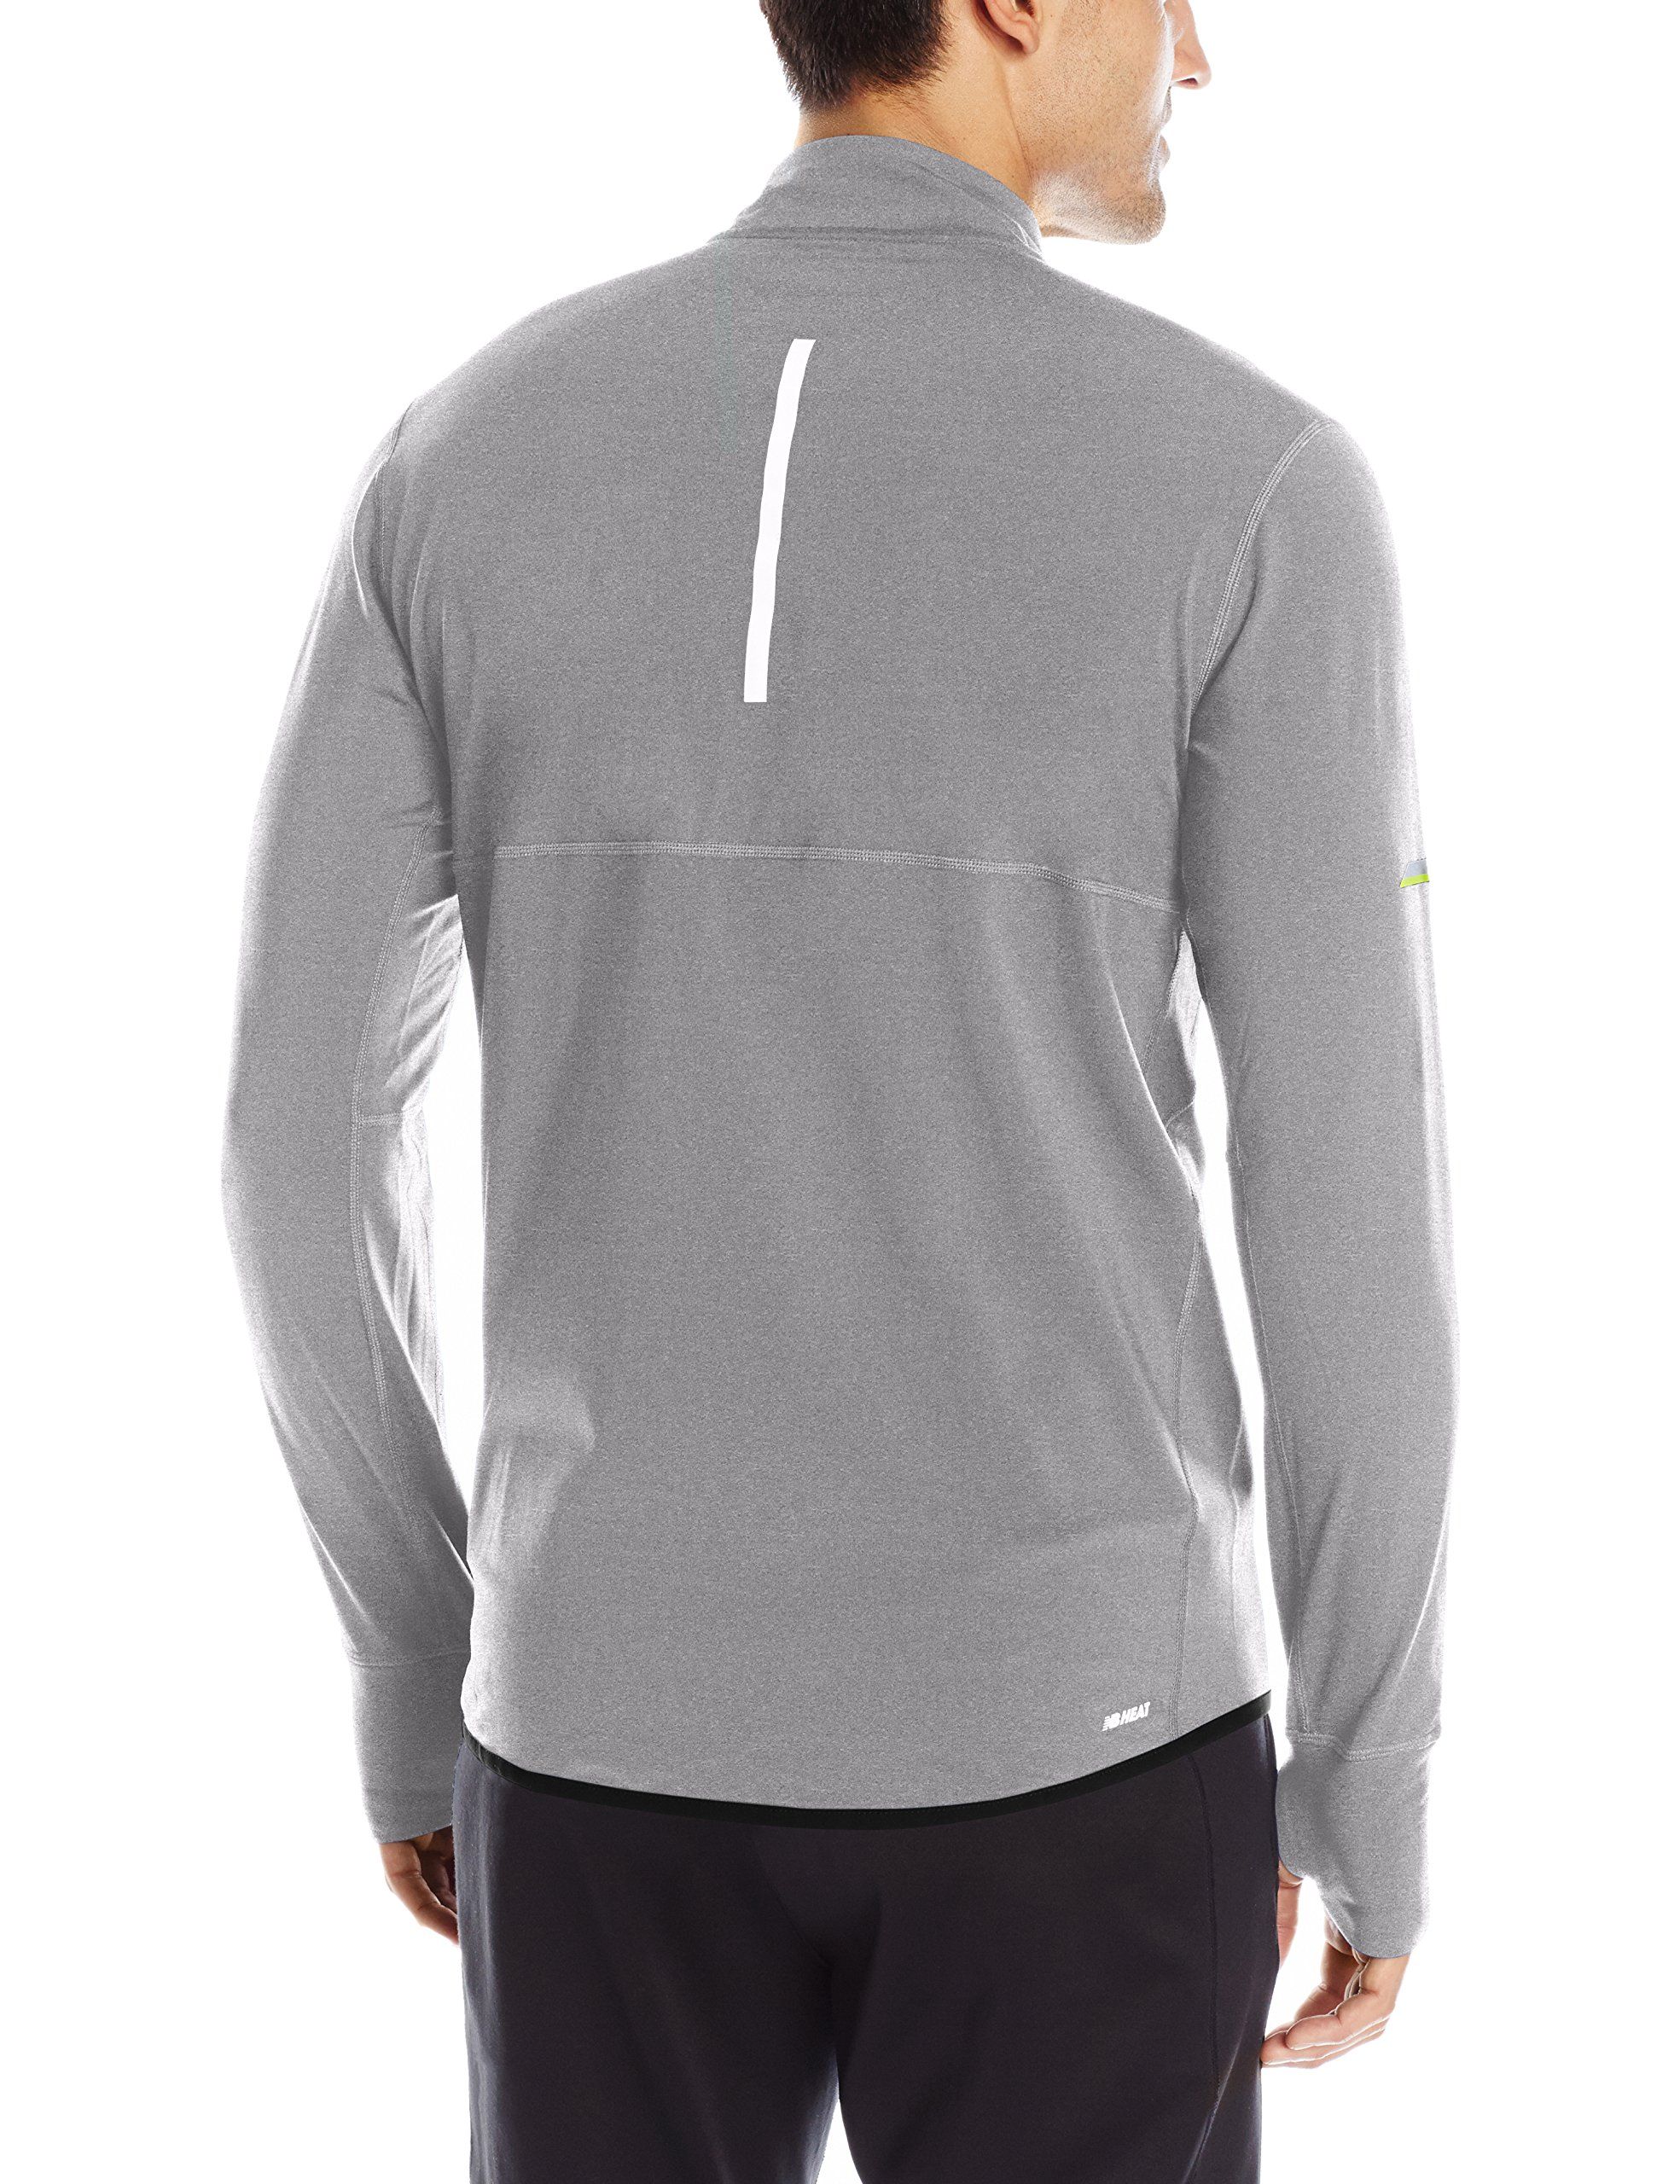 New Balance Men's Heat Half Zip Jacket, Athletic Grey, X-Large by New Balance (Image #2)